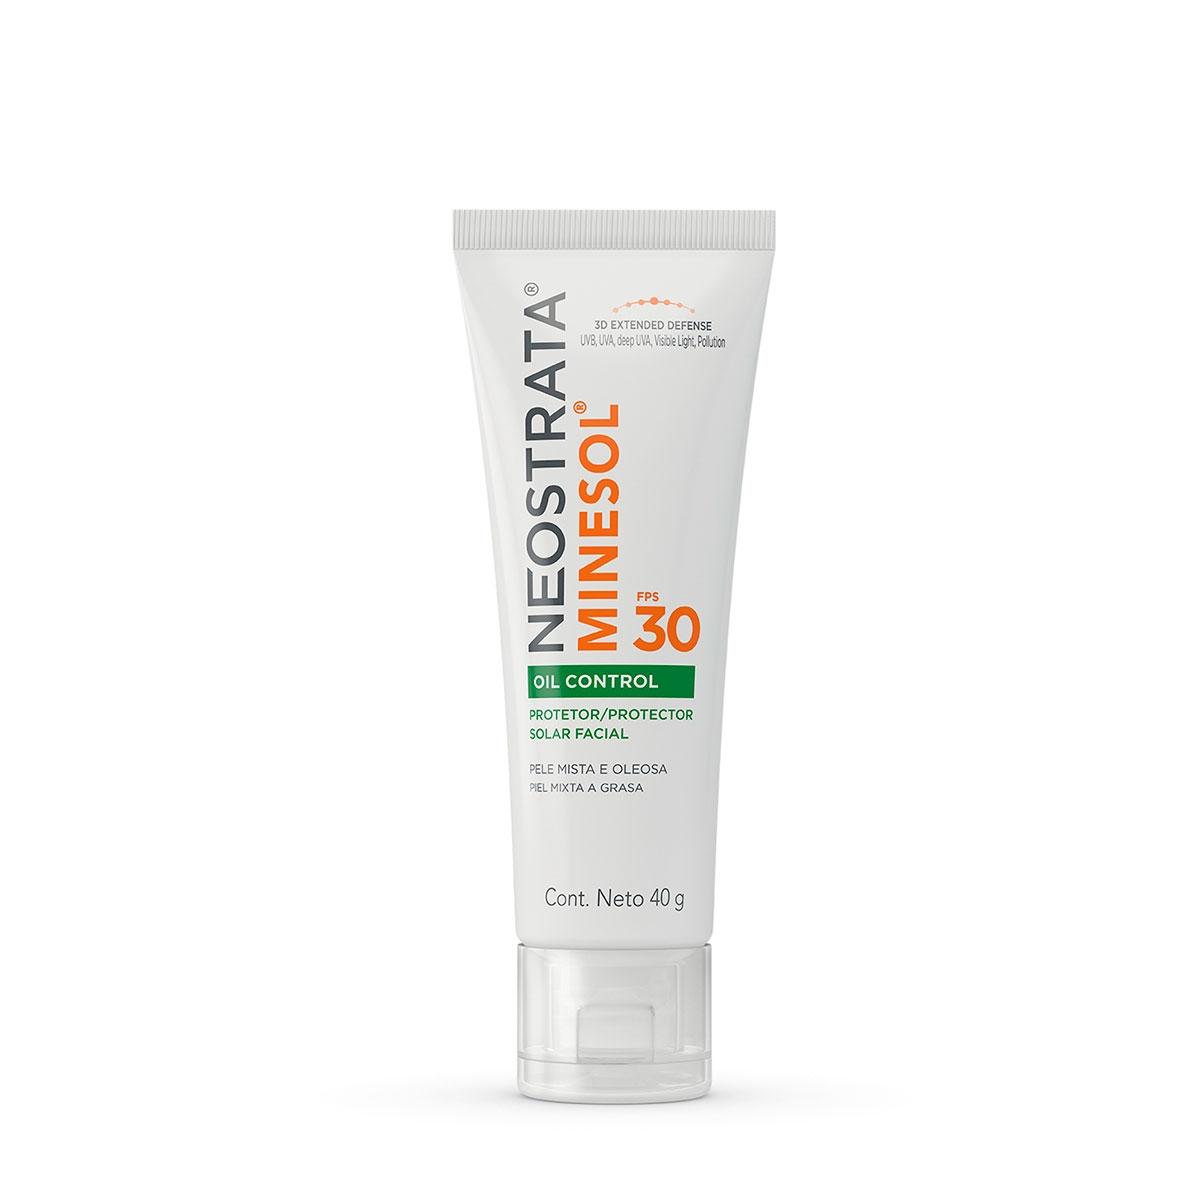 Protetor Solar Facial NeoStrata Minesol Oil Control Pele Oleosa FPS 30 com 40g 40g